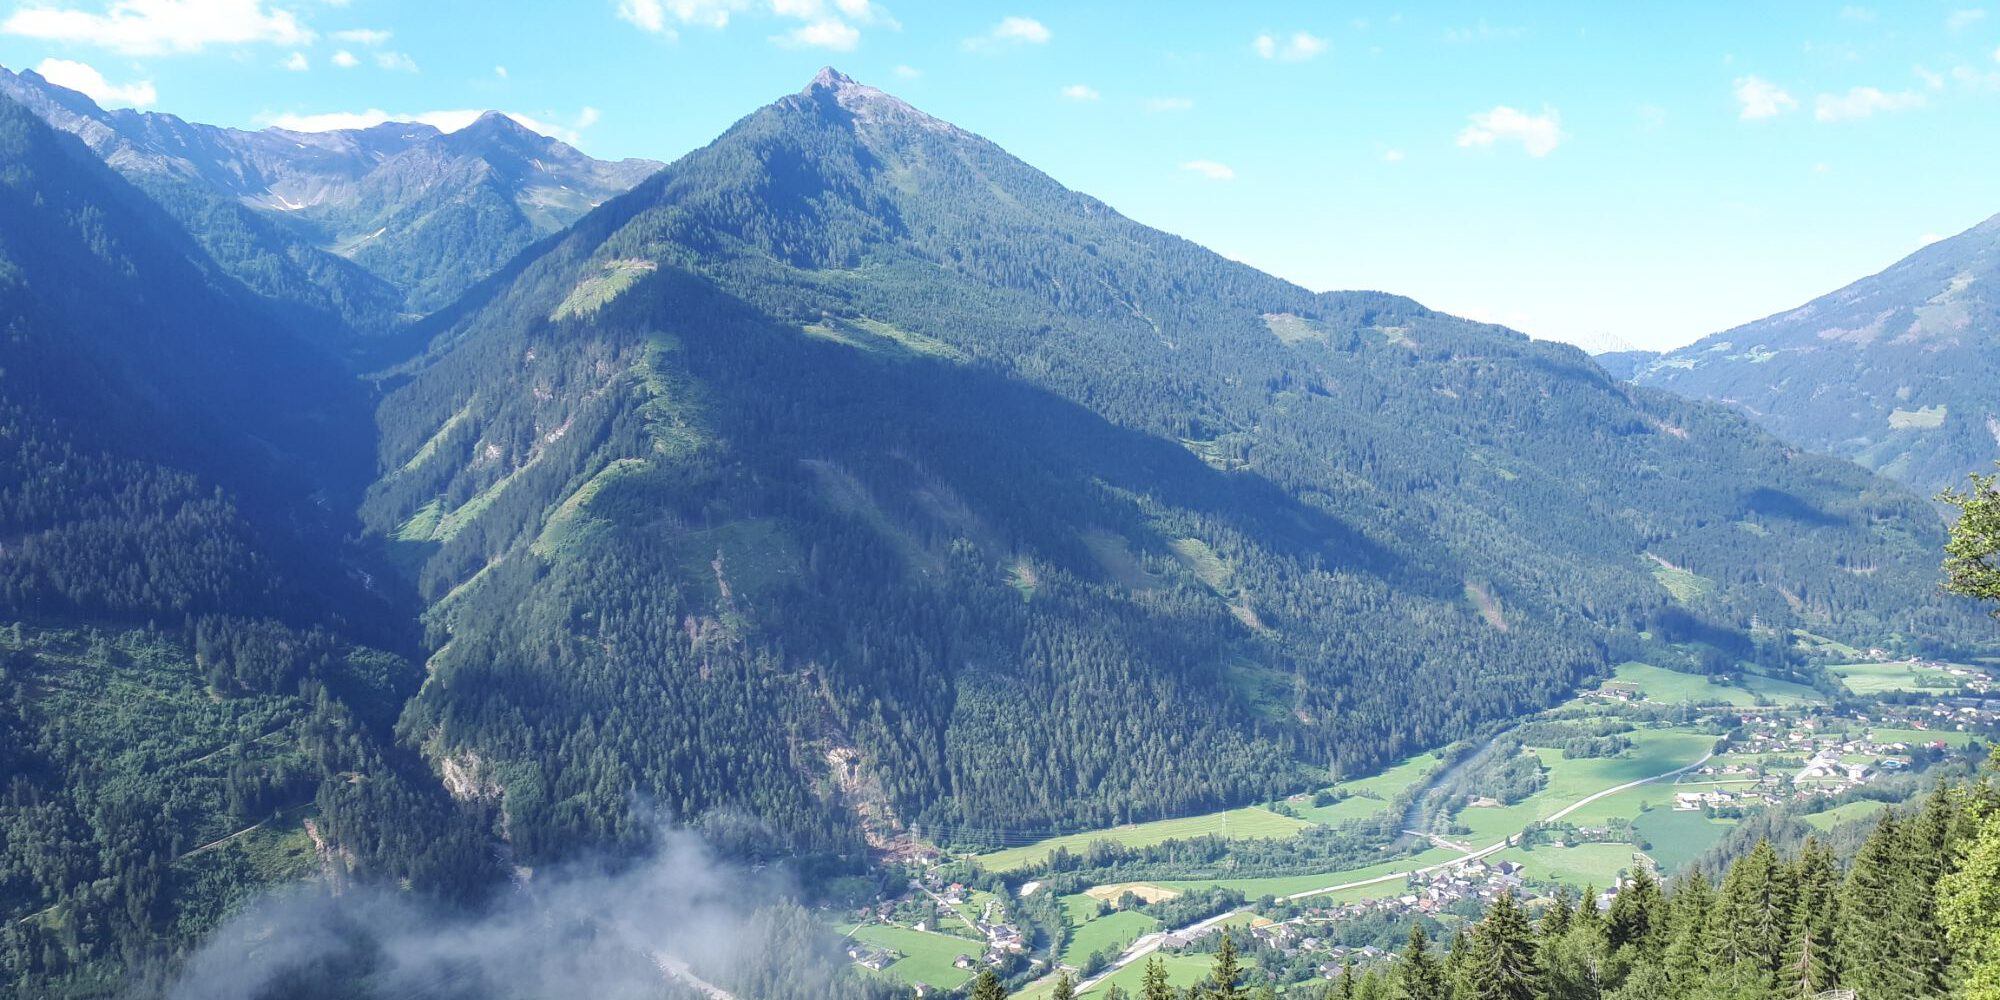 Alpe Adria Trail Etappe 6